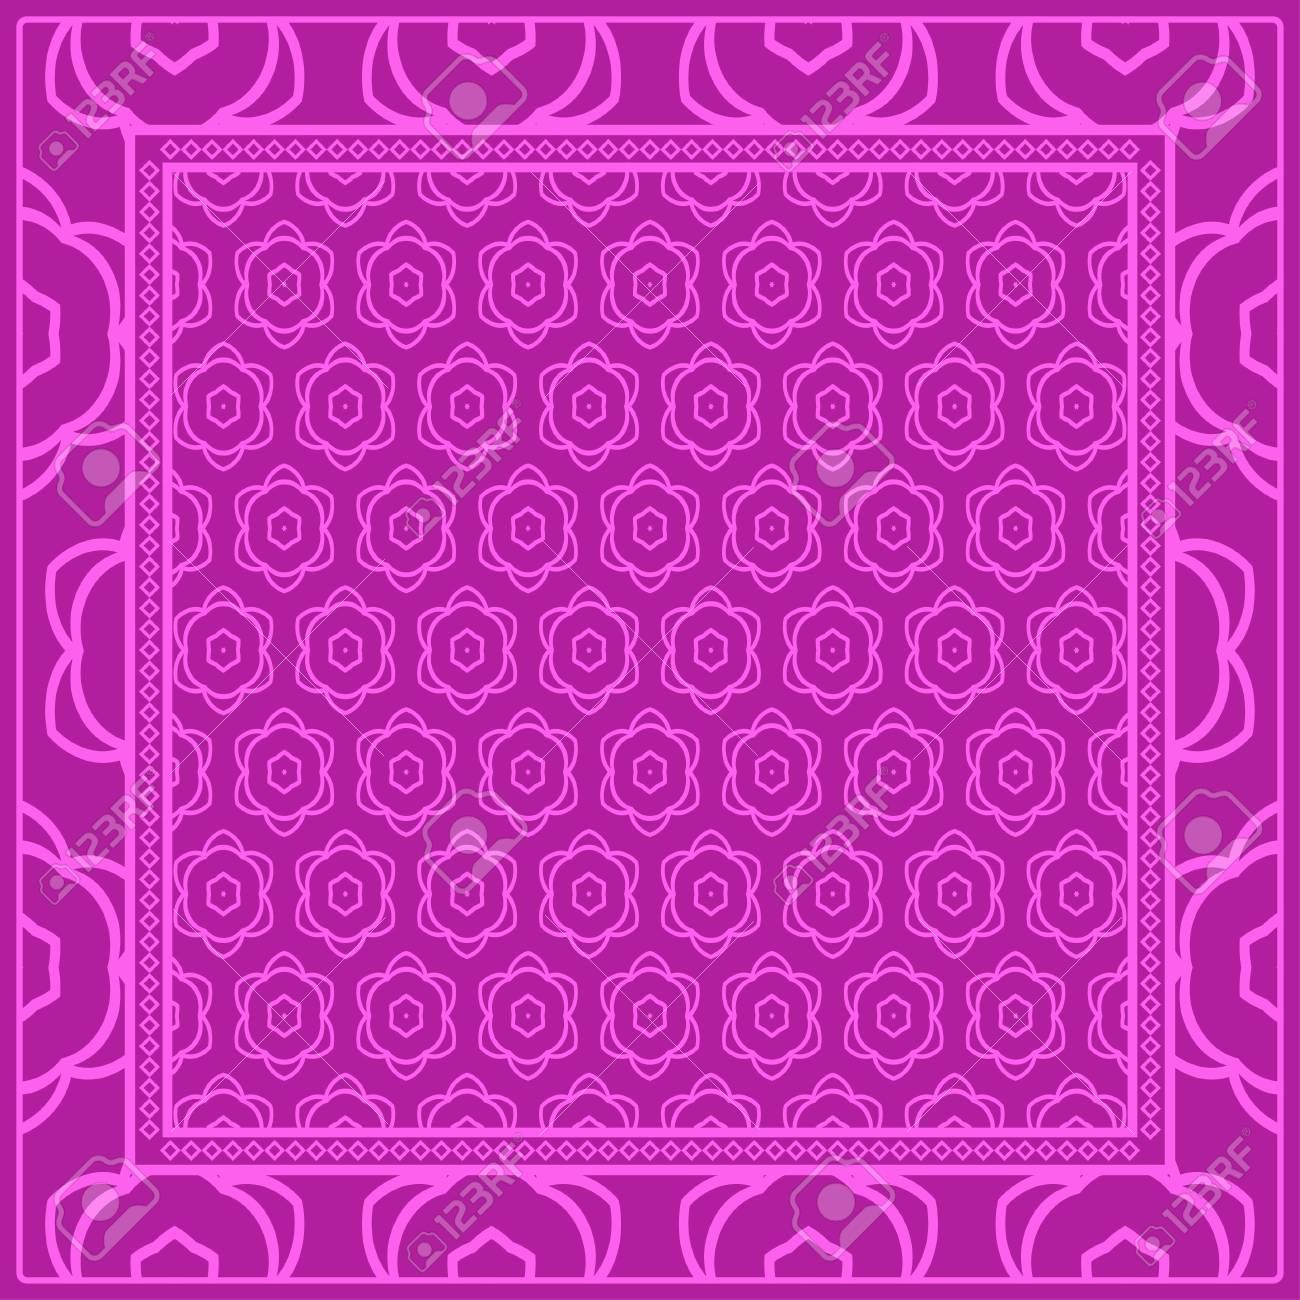 Geometric Ornament With Frame Border Art deco Background 1300x1300